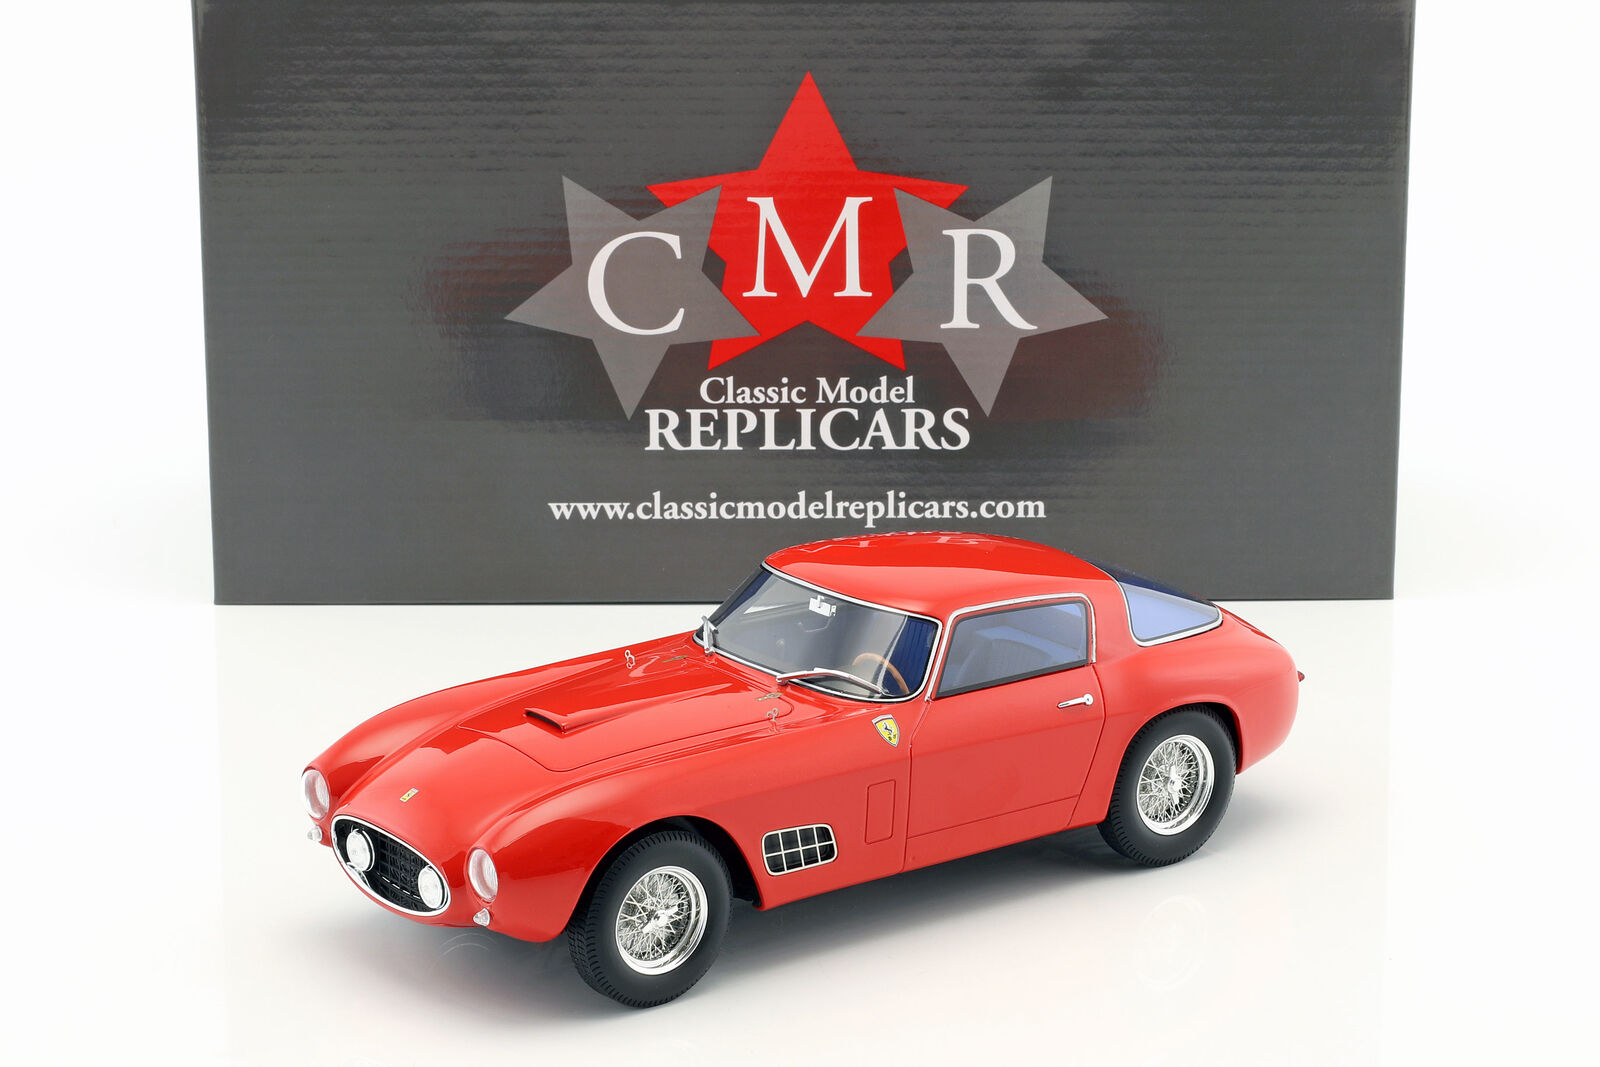 CMR 1/18 フェラーリ 250 GT ベルリネッタ コンペティツィオーネ 1956 レッド Ferrari 250 GT Berlinetta Competizione year 1956 red